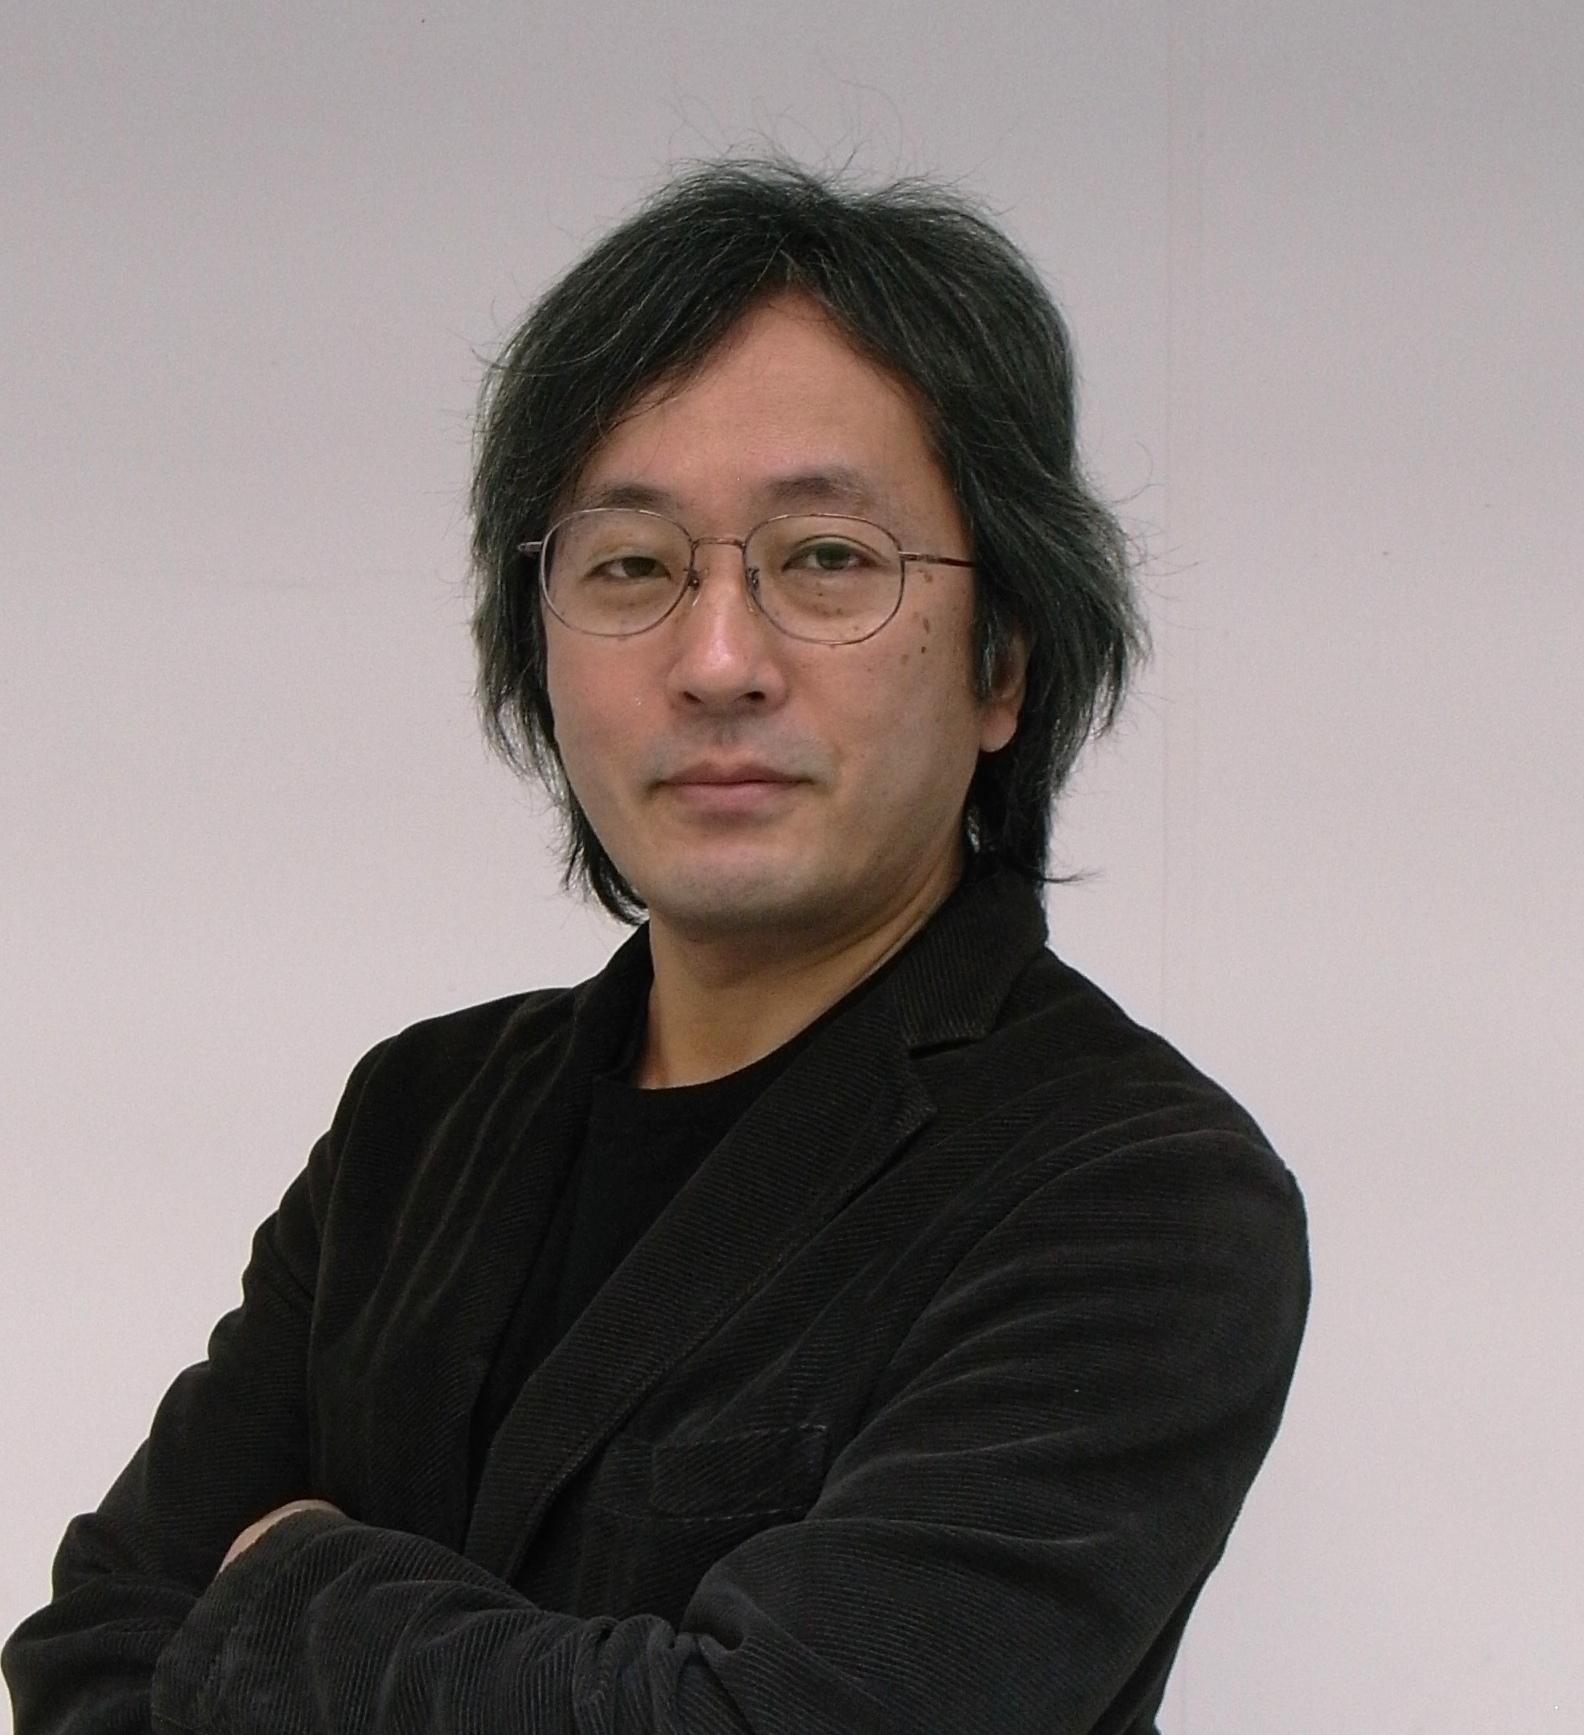 青木昌彦 - Masahiko Aoki - Jap...